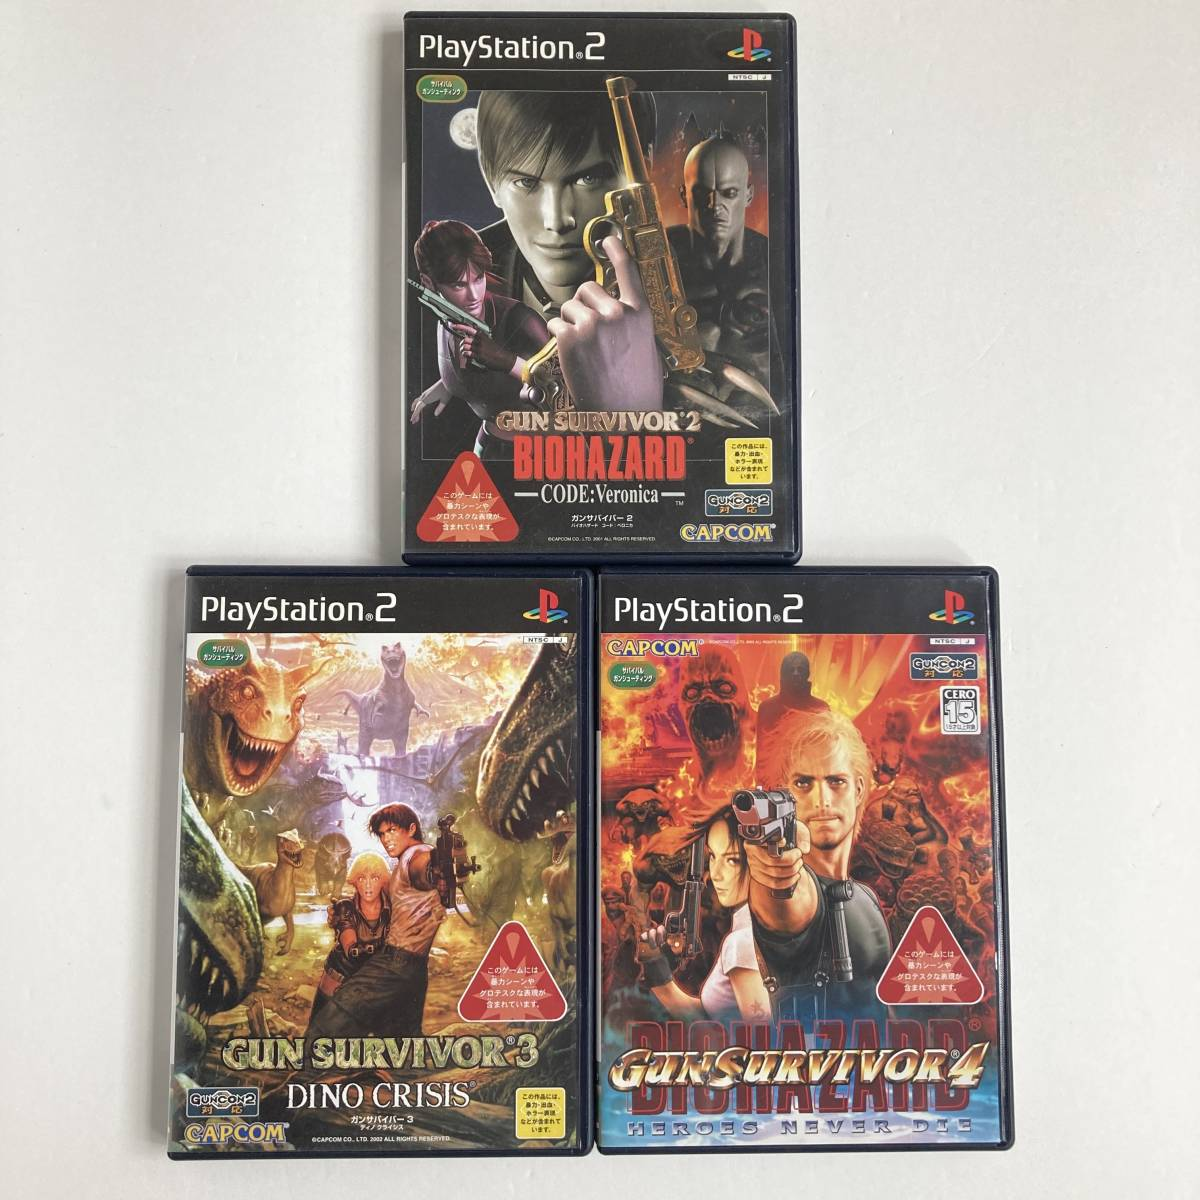 PS2 ガンサバイバー2 3 4 セット ガンコン2対応 / Lot 3 Gun Survivor 2 3 4 Resident Evil Dino Crisis PS2 Playstation 2 Game Japan